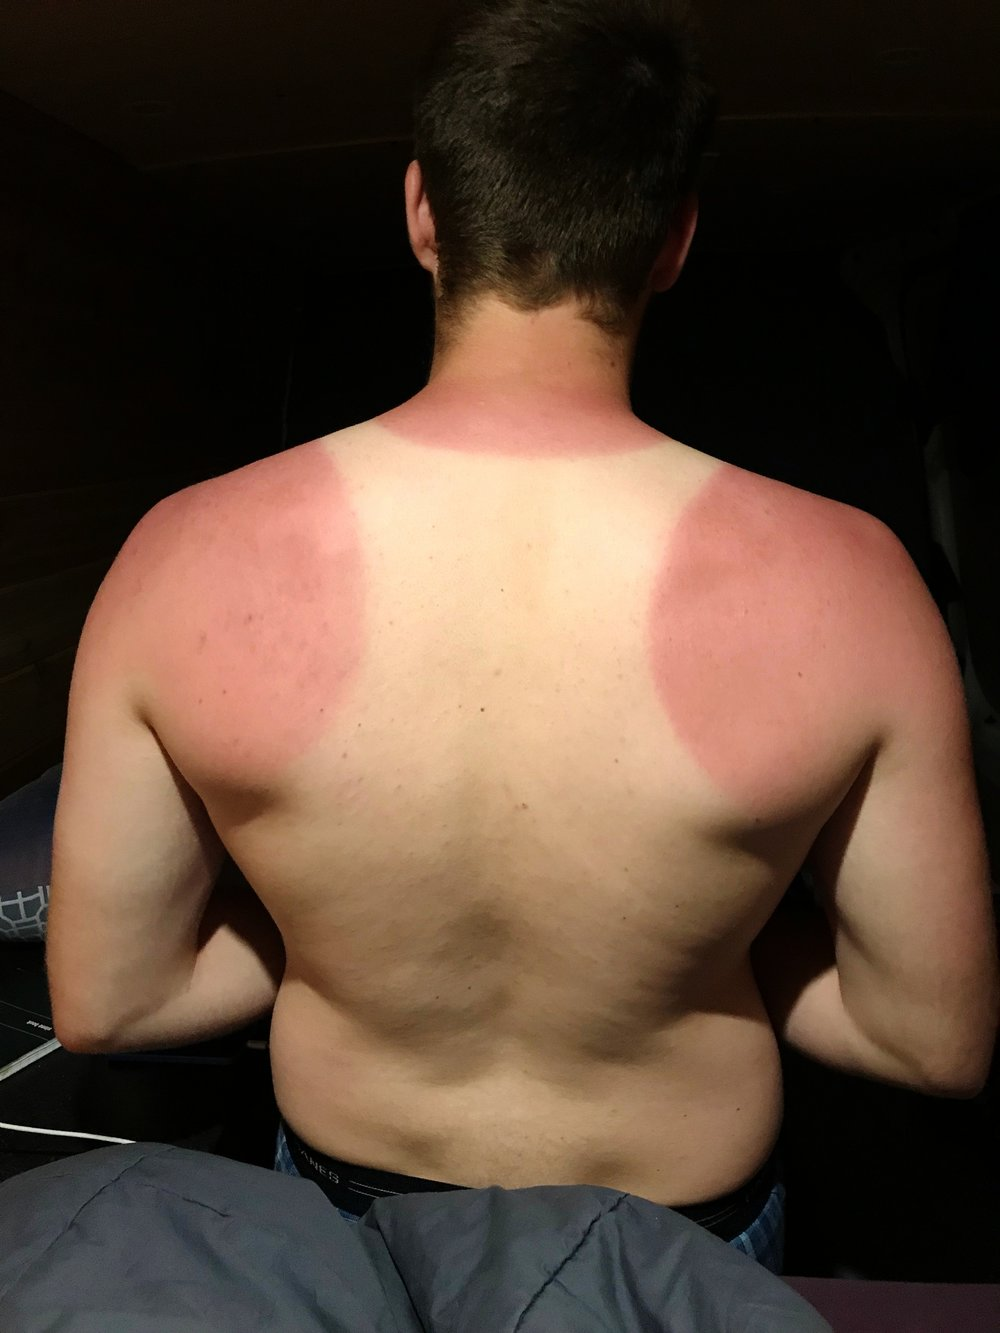 Ian got an insane sunburn one day when we went running. Definitely a do where sunscreen if your van breaks down.